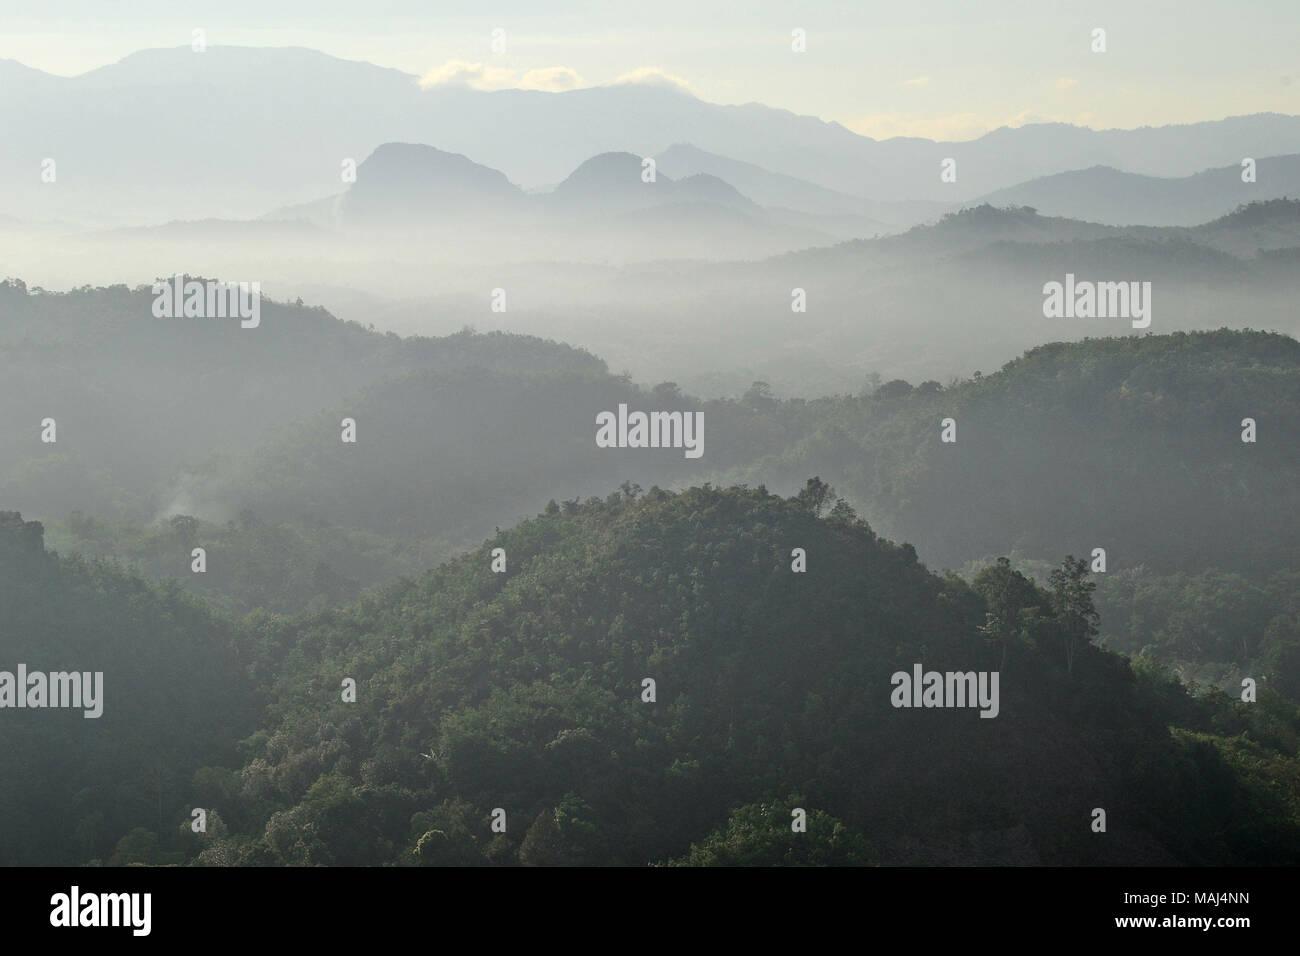 Meratus mountains of South Kalimantan, Indonesia. - Stock Image